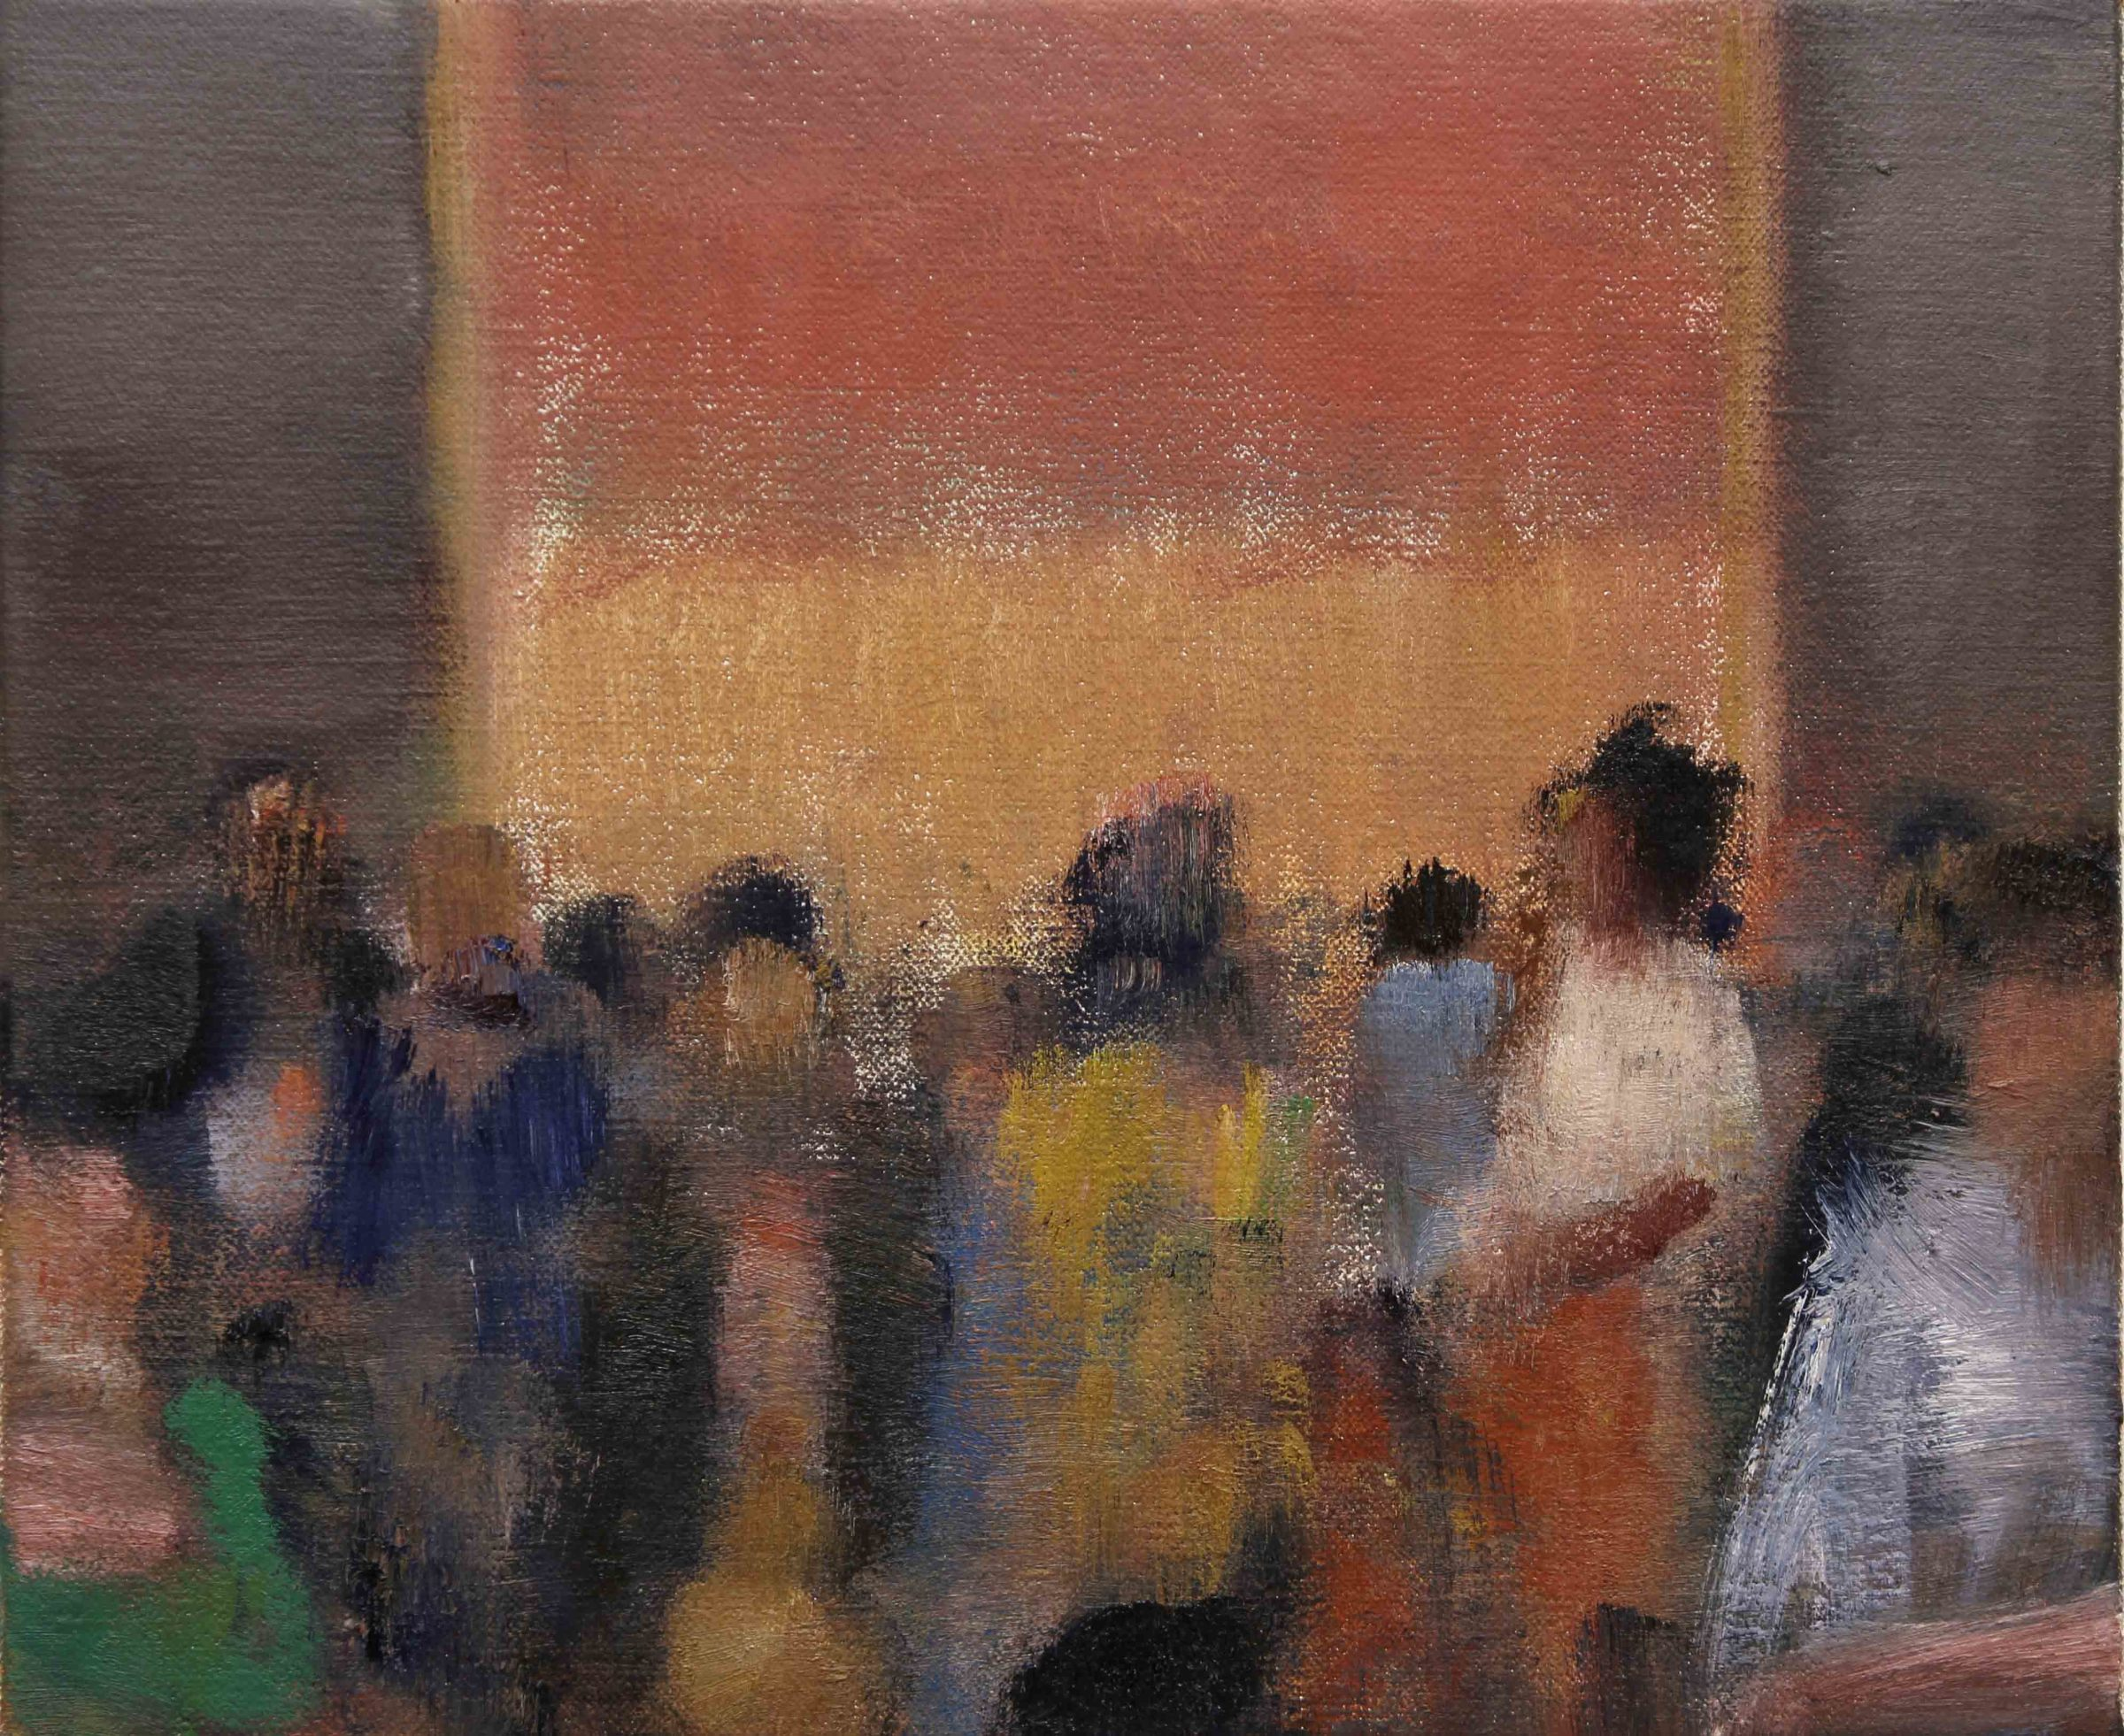 "<span class=""link fancybox-details-link""><a href=""/artists/59-simon-nicholas/works/540-simon-nicholas-gallery-study-4/"">View Detail Page</a></span><div class=""artist""><strong>Simon Nicholas</strong></div> <div class=""title""><em>Gallery Study 4</em></div> <div class=""medium"">Oil on Linen</div> <div class=""dimensions"">10 x 12.5 inches<br /> SOLD</div>"